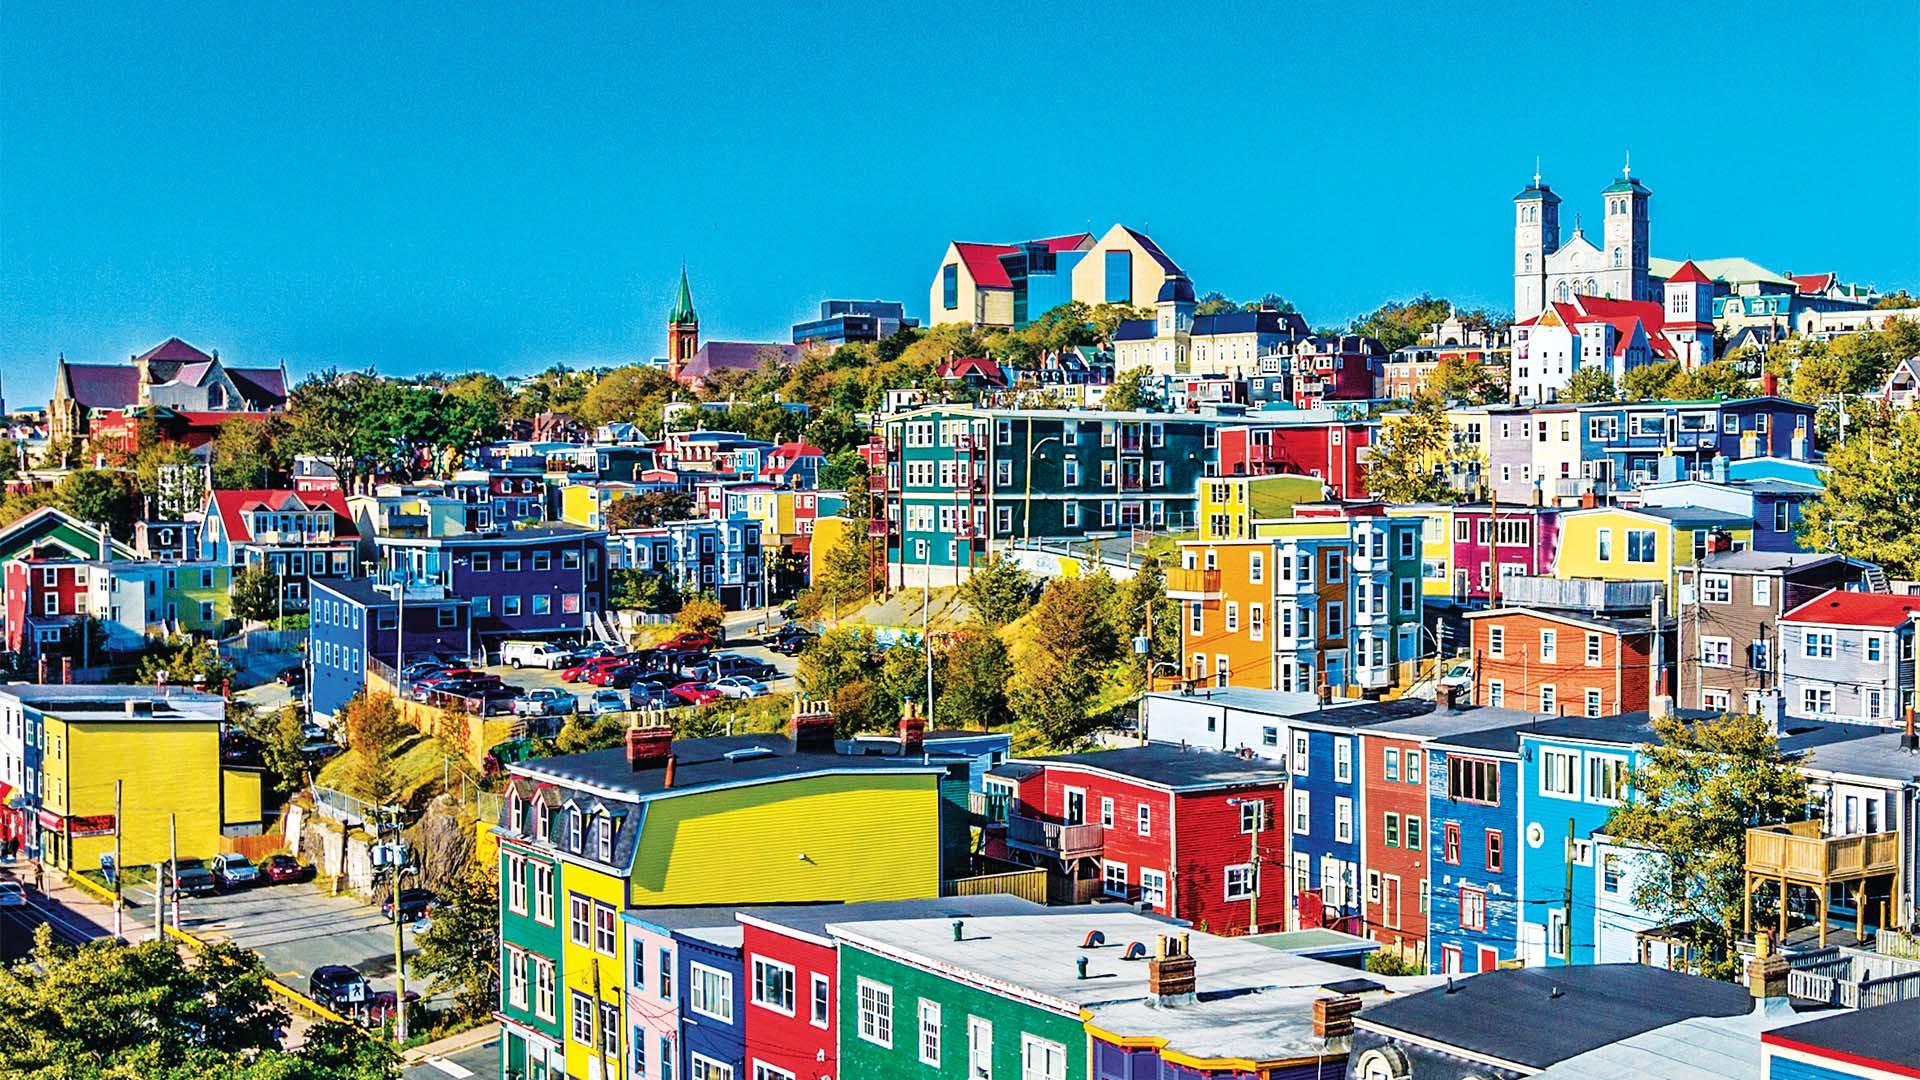 St John's skyline, Newfoundland & Labrador